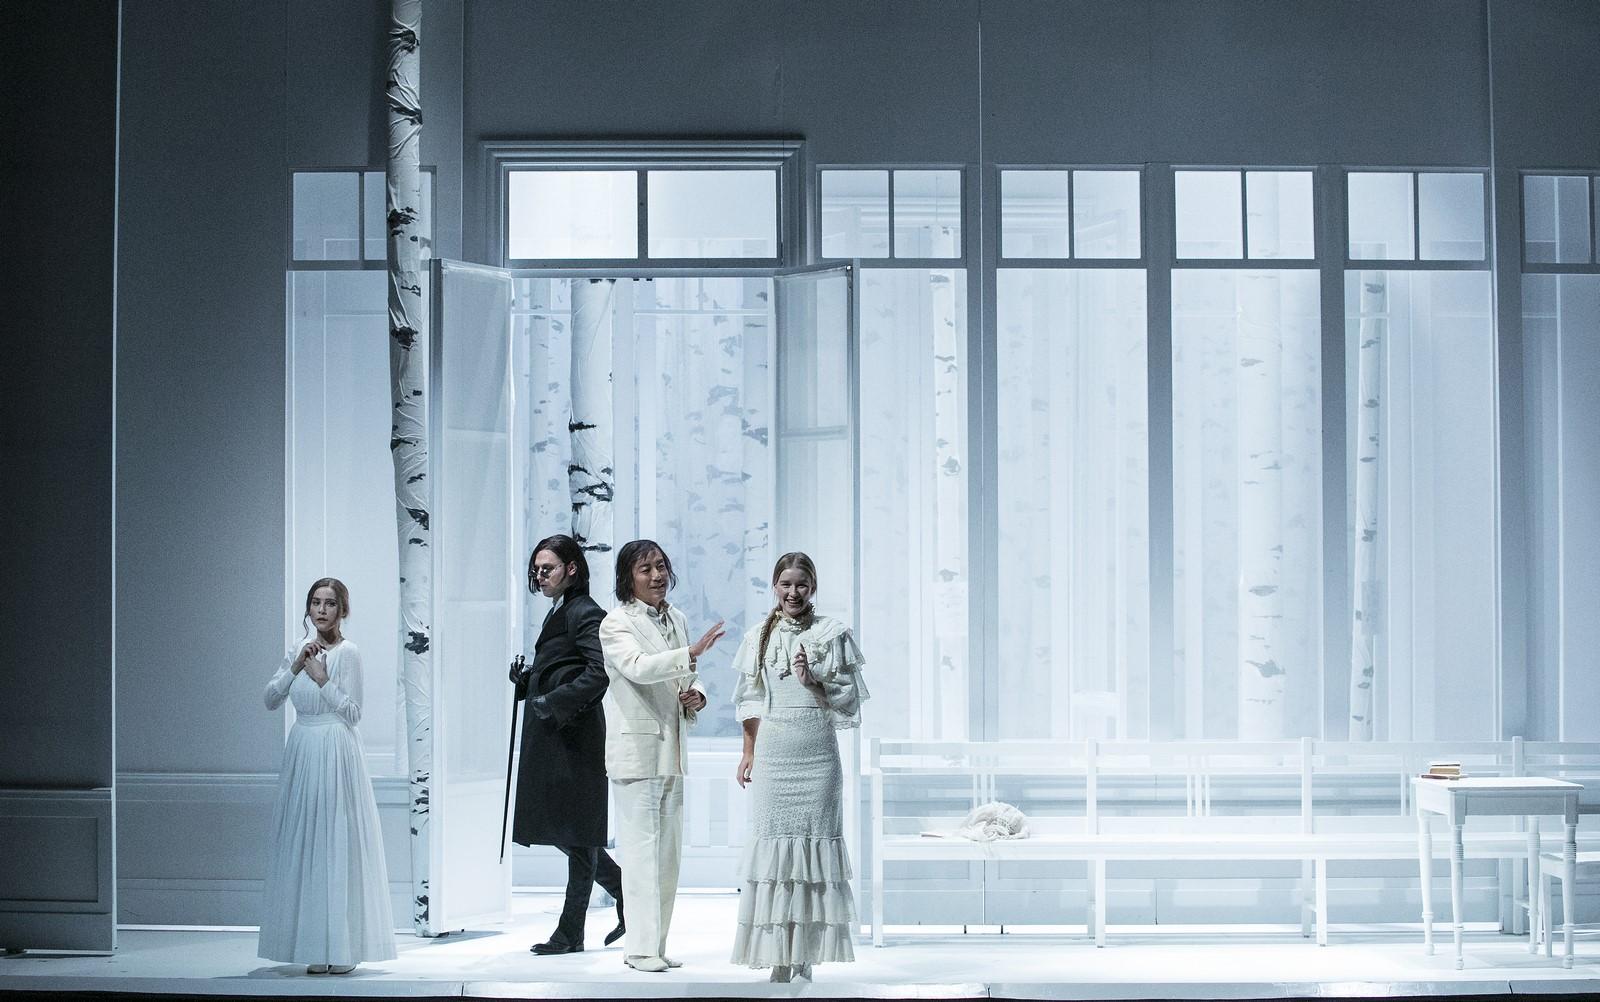 Anmeldelse: Eugen Onegin, Det Kongelige Teater (Den Jyske Opera)